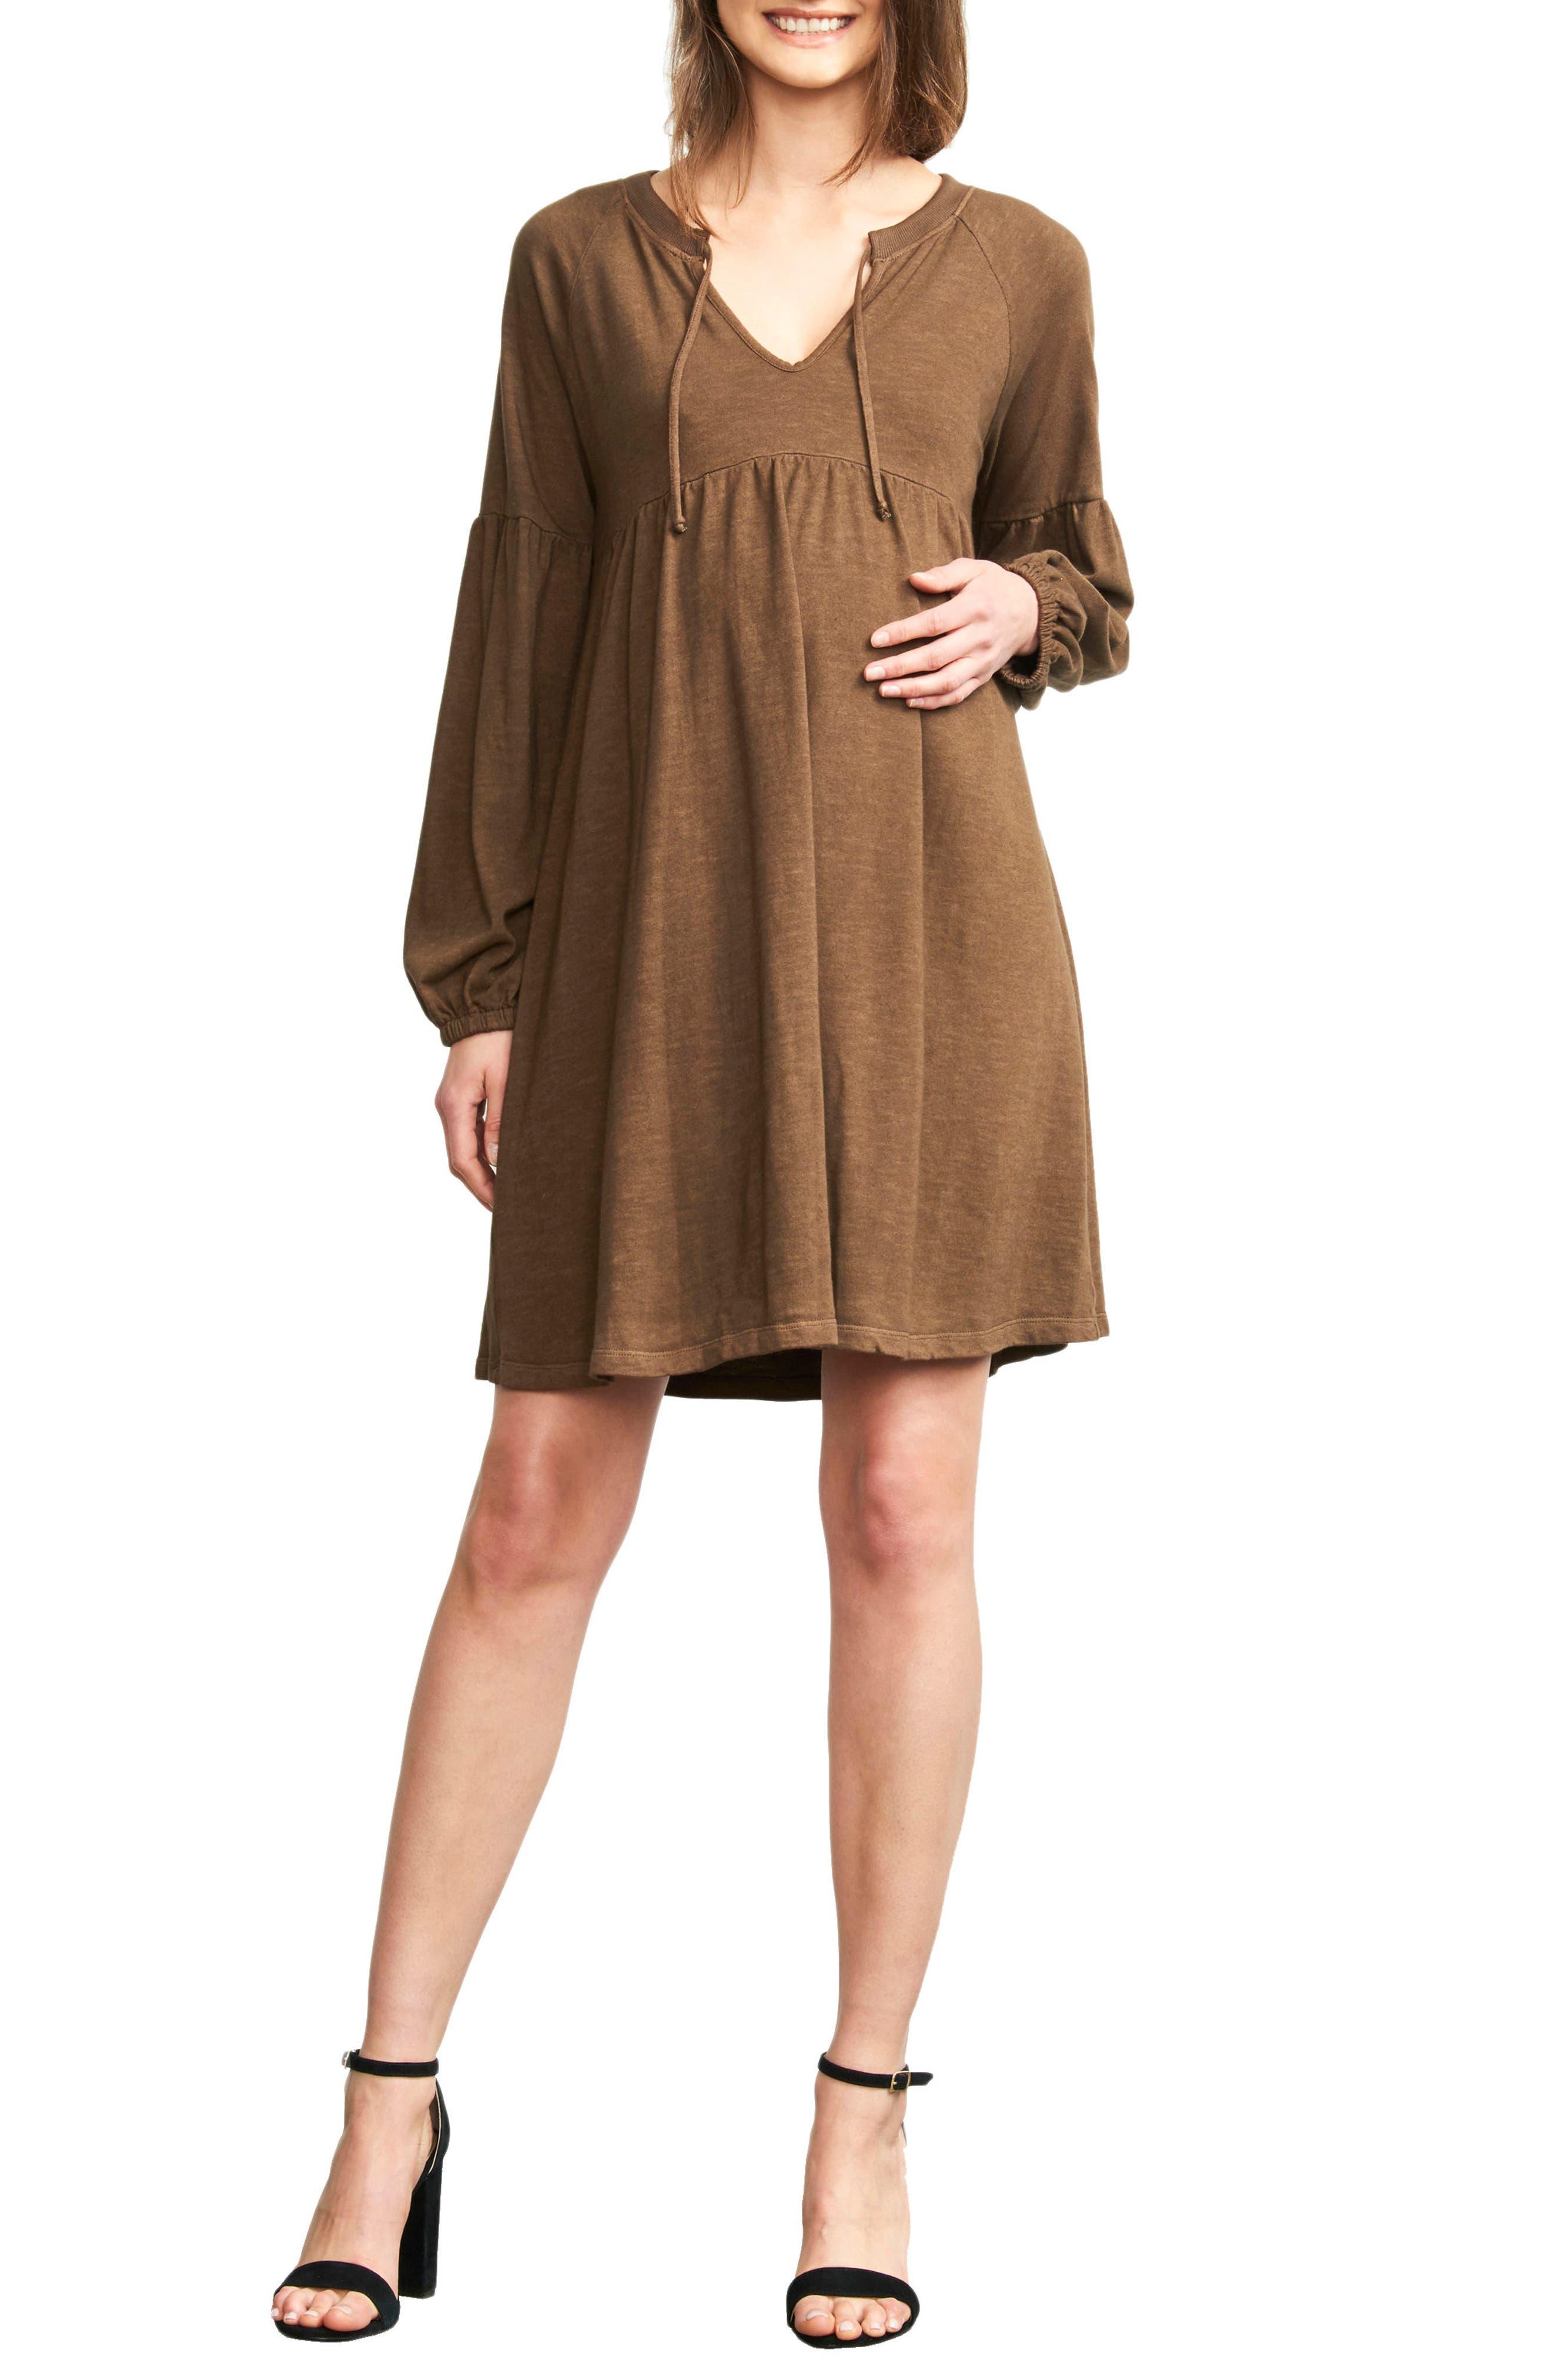 MATERNAL AMERICA, Drawstring Neck Maternity Dress, Main thumbnail 1, color, COCOA